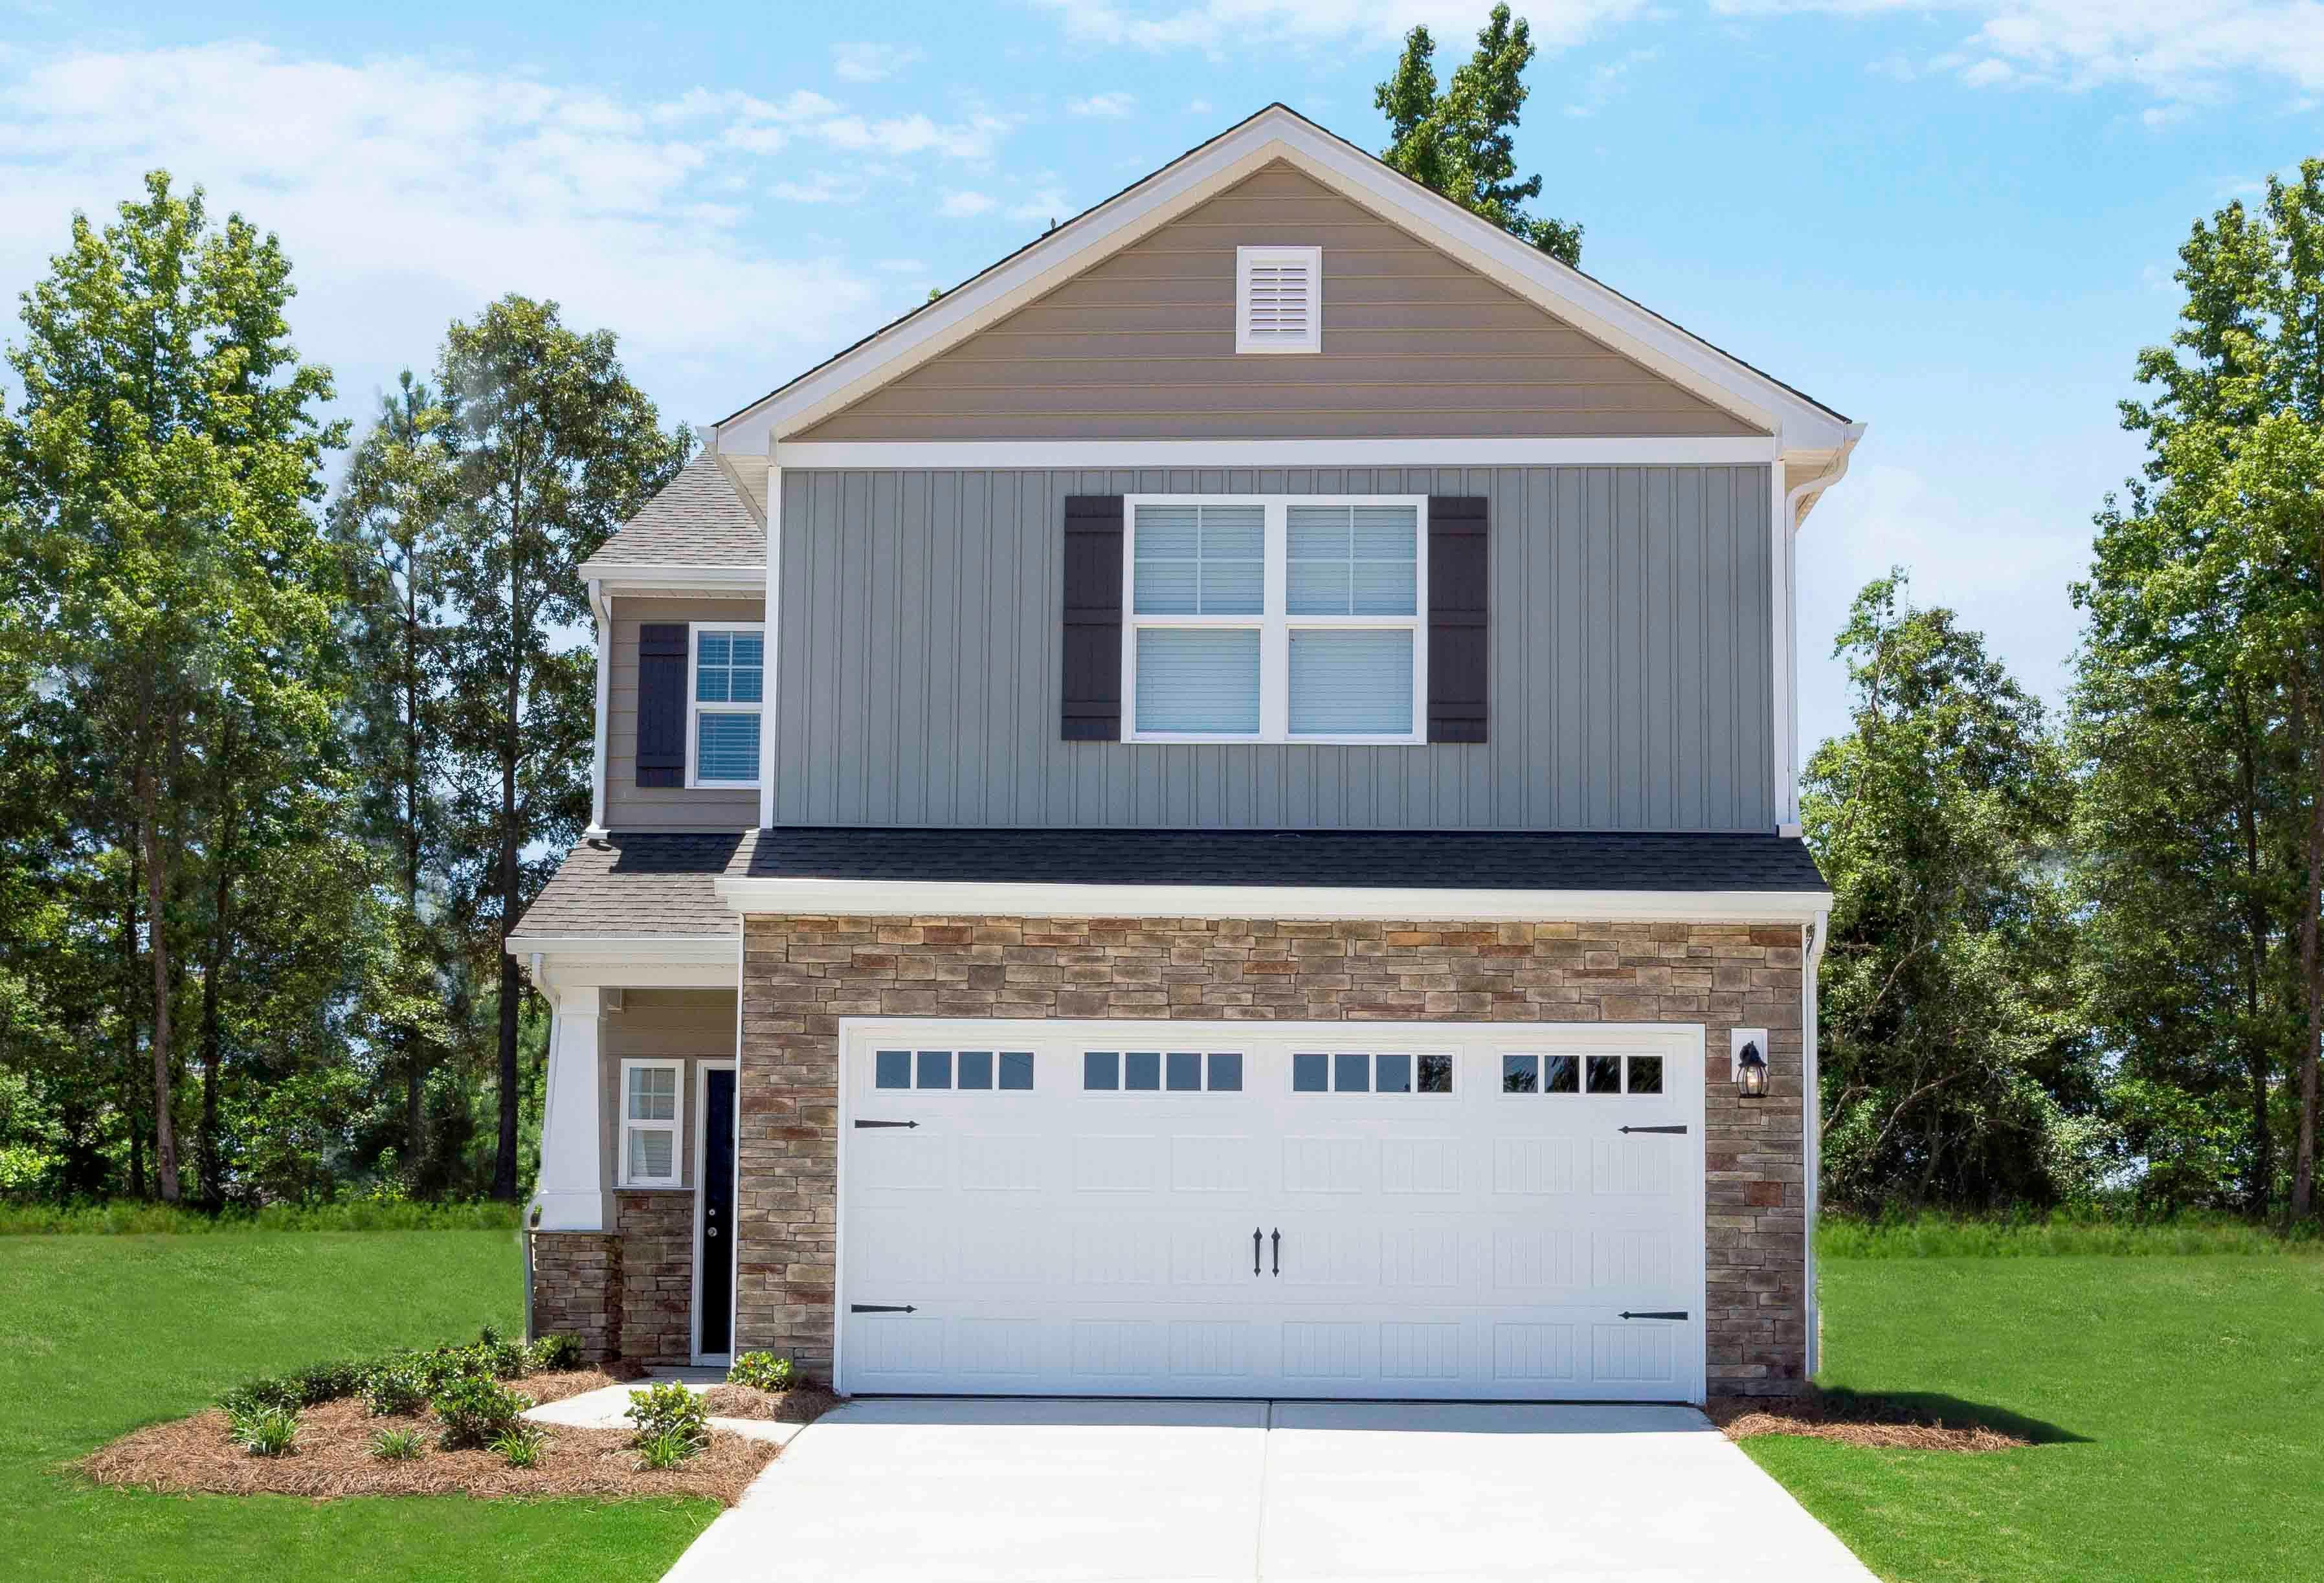 Pecan Ridge in Fort Mill SC New Homes Floor Plans by LGI Homes